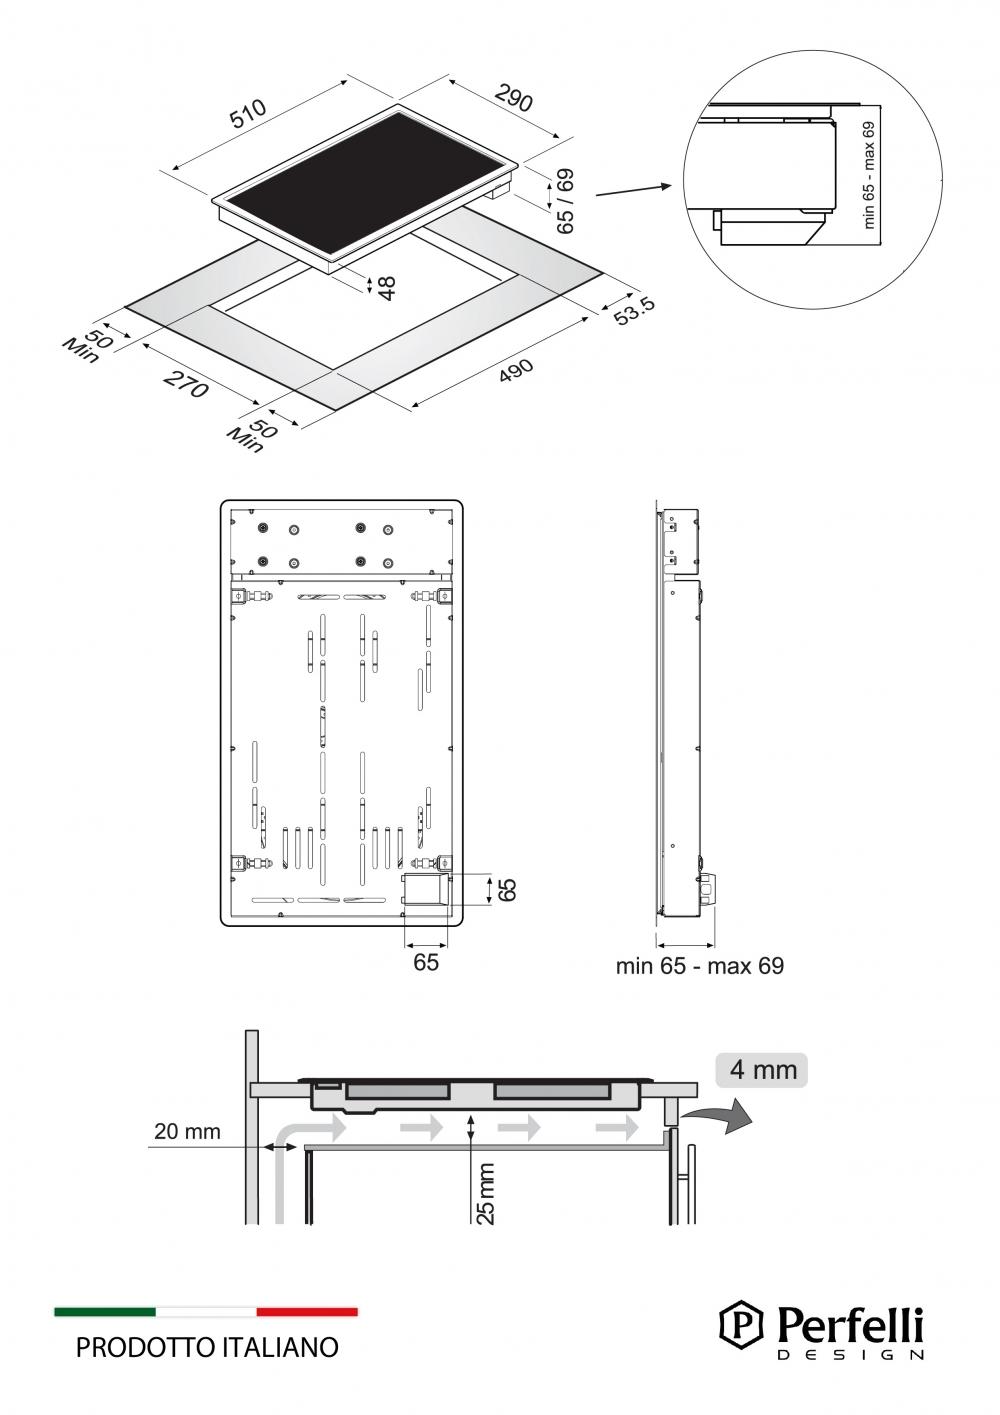 Glass ceramic surface Perfelli design HVC 3210 WH RETRO